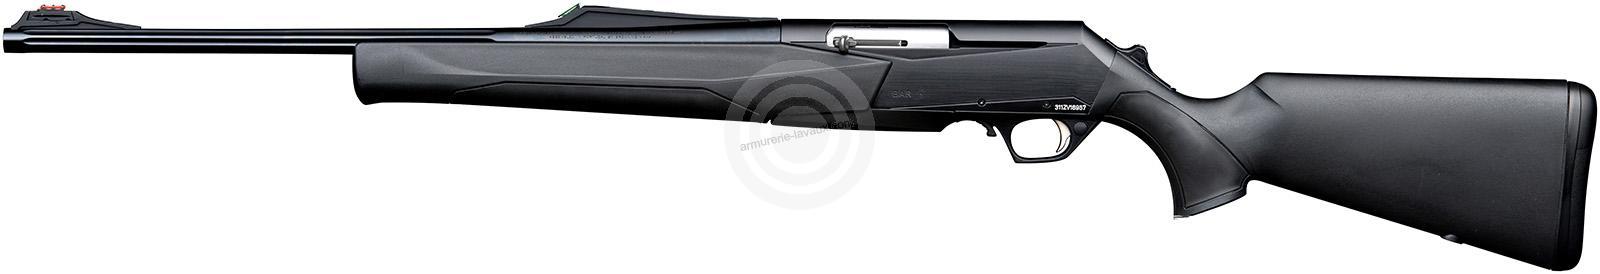 Carabine semi-automatique BROWNING BAR MK3 Composite Fluted Gaucher HC